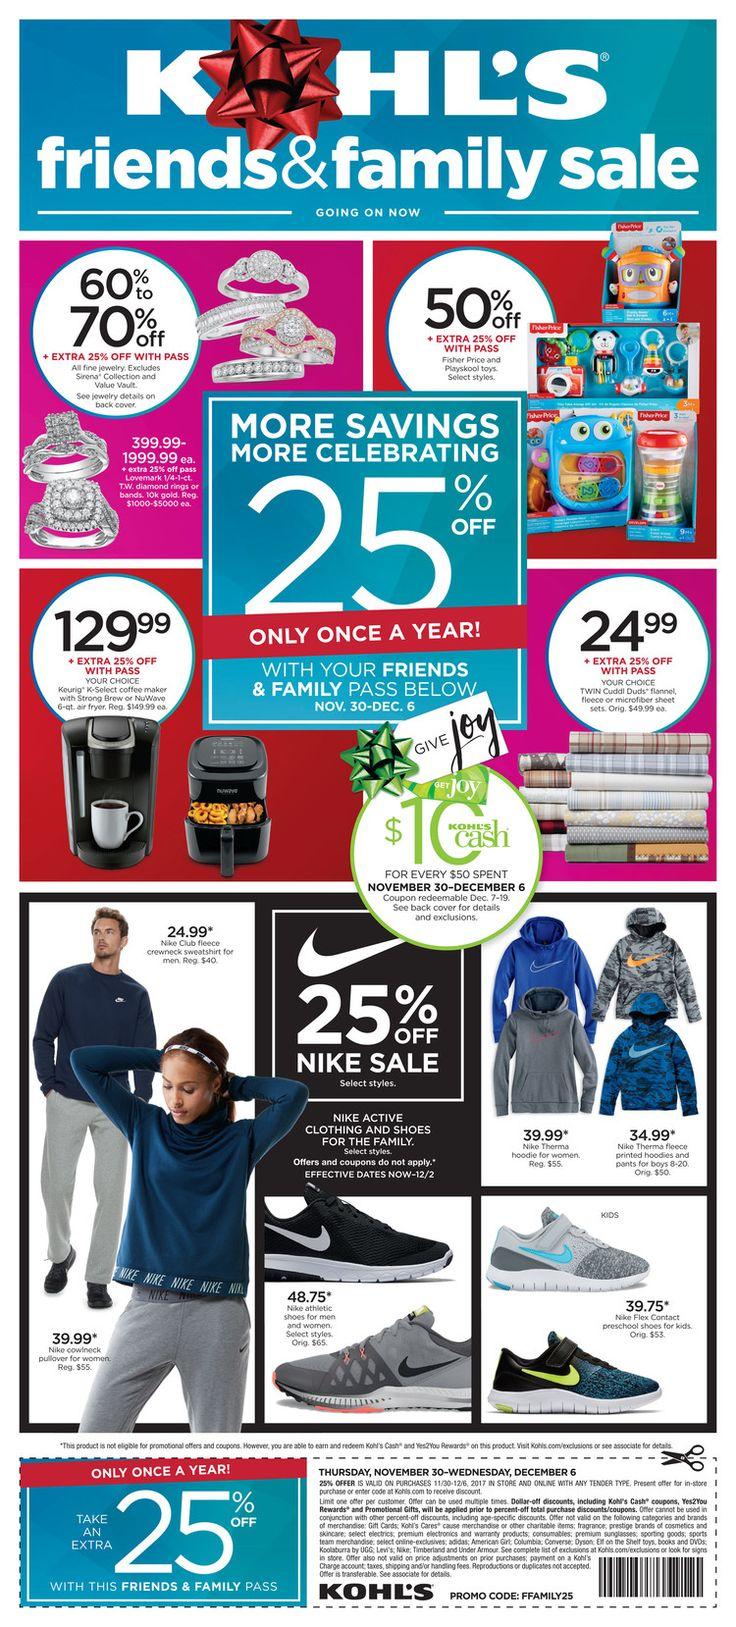 Kohl's Weekly Ad November 30 - December 2, 2017 - http://www.olcatalog.com/dept-clothing/kohls-weekly-ad.html